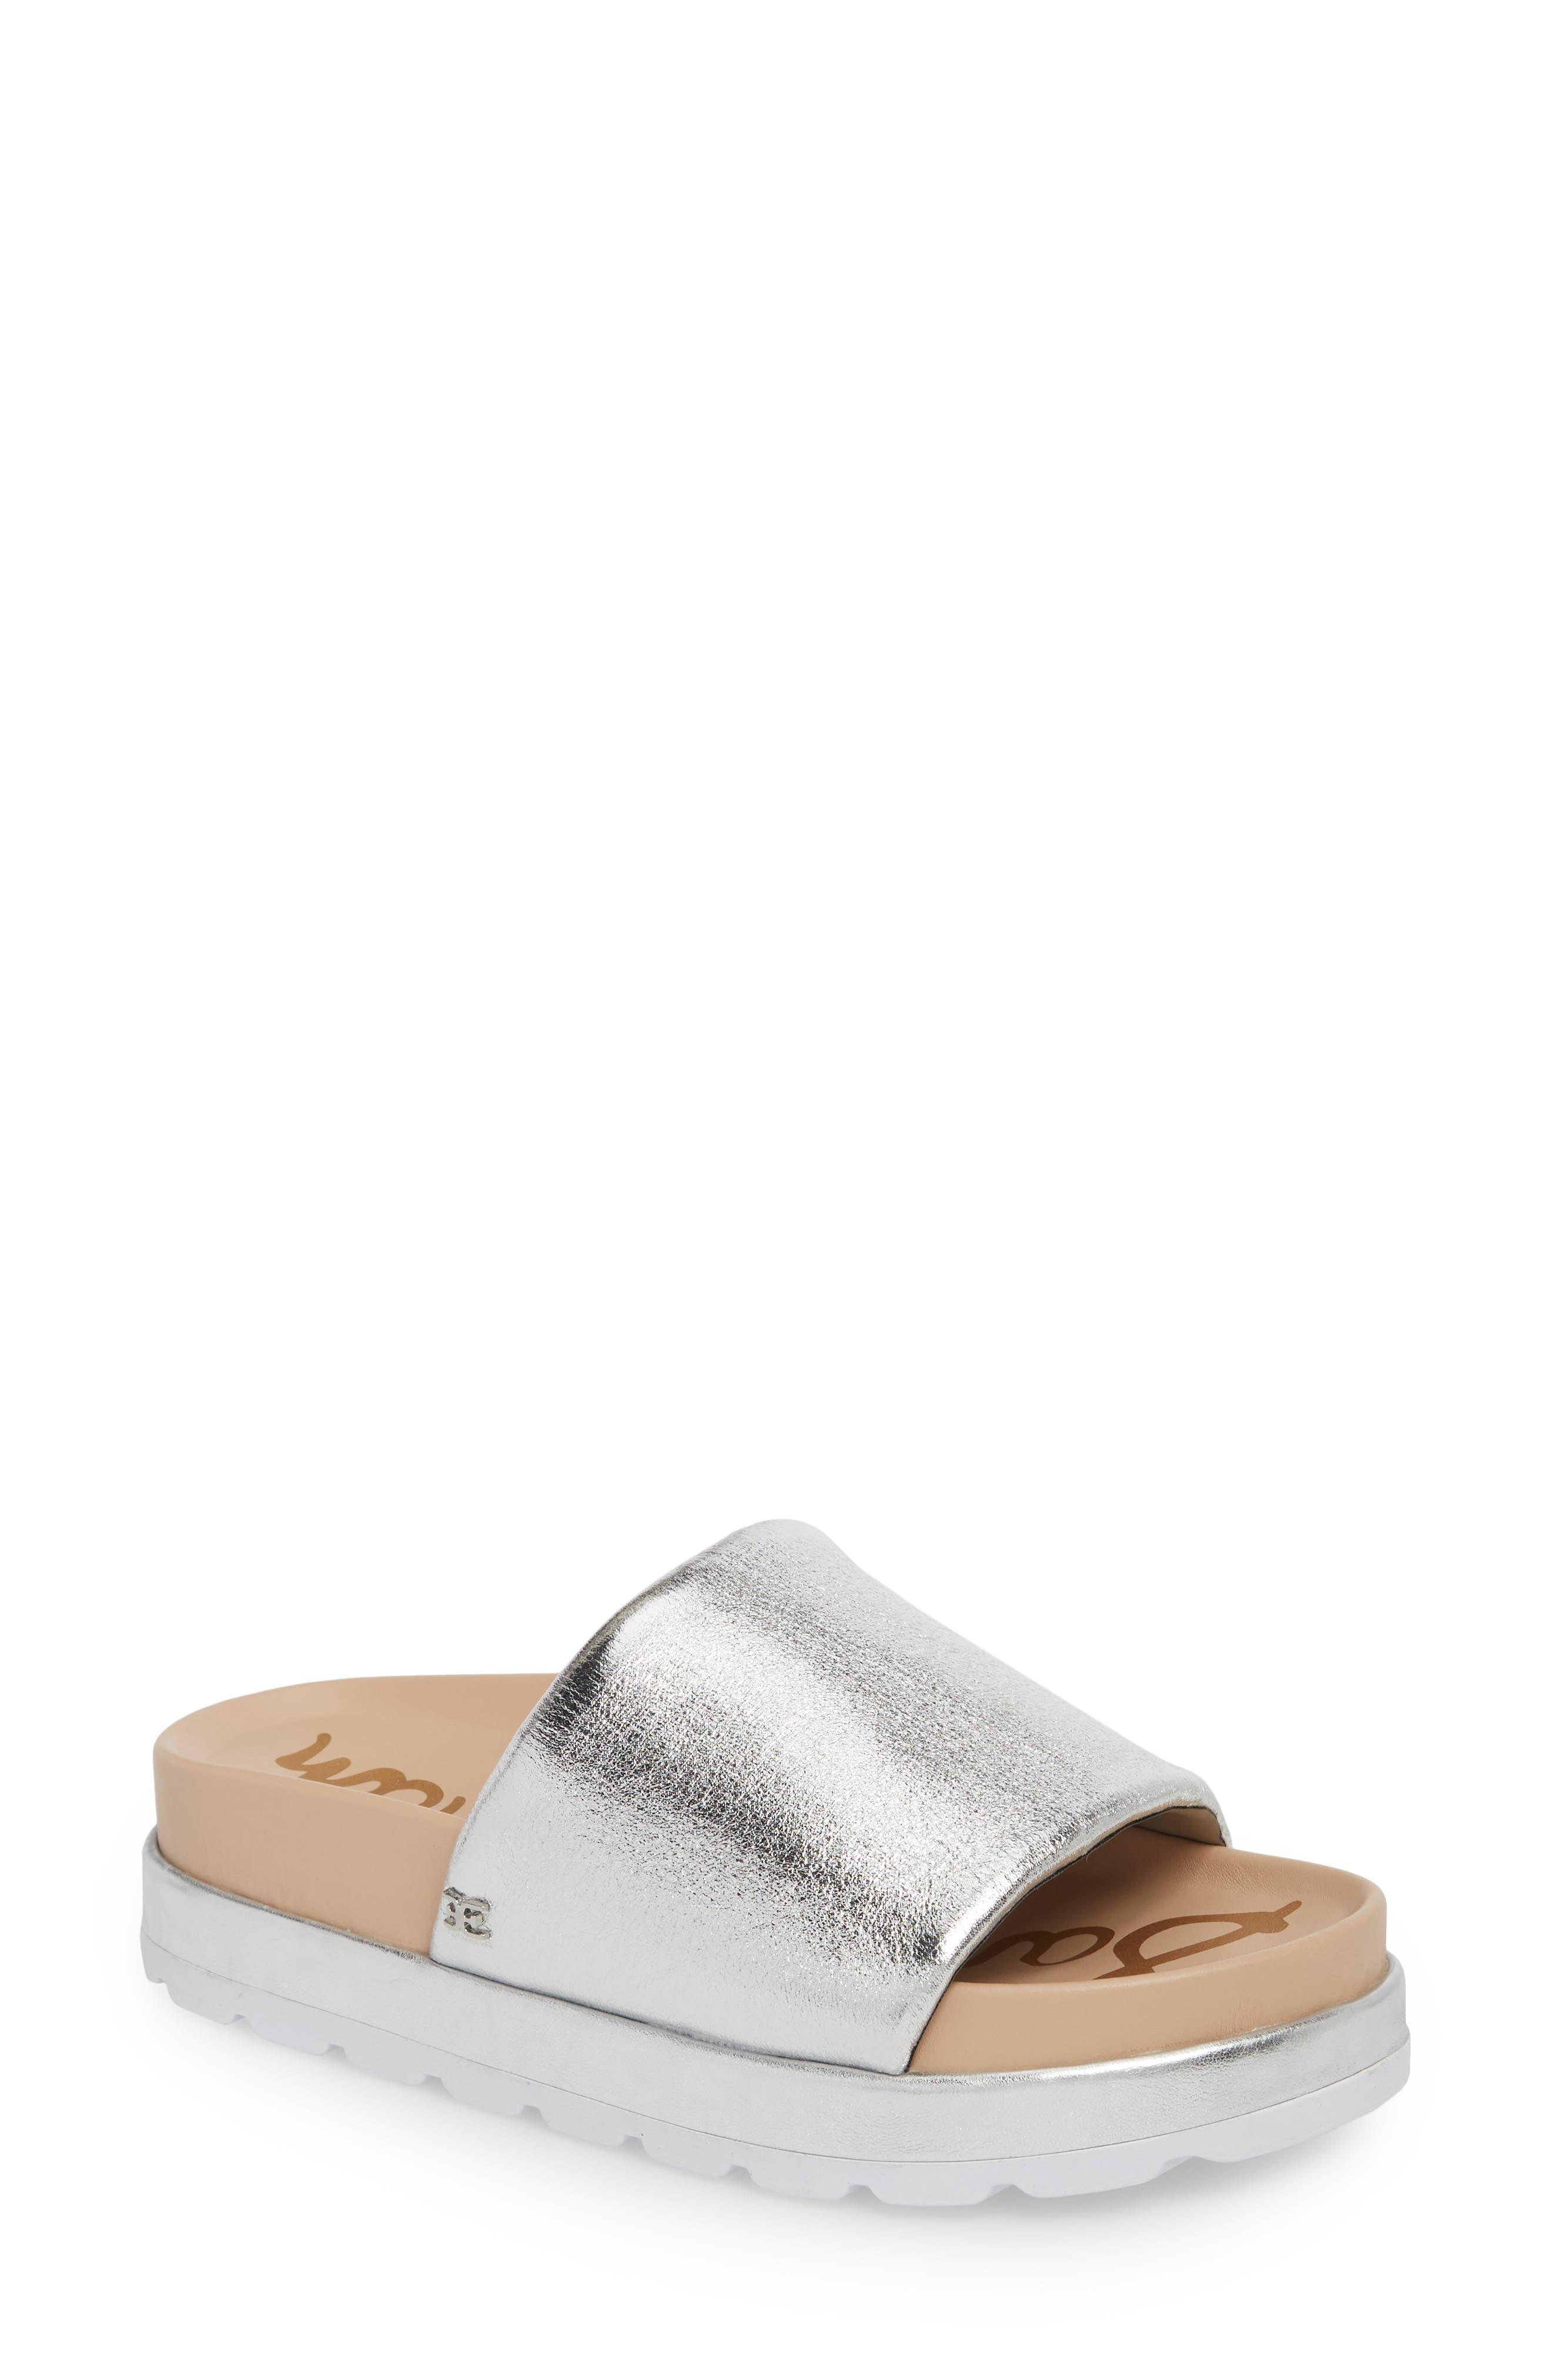 Shaye Slide Sandal,                             Main thumbnail 1, color,                             Soft Silver Metallic Fabric